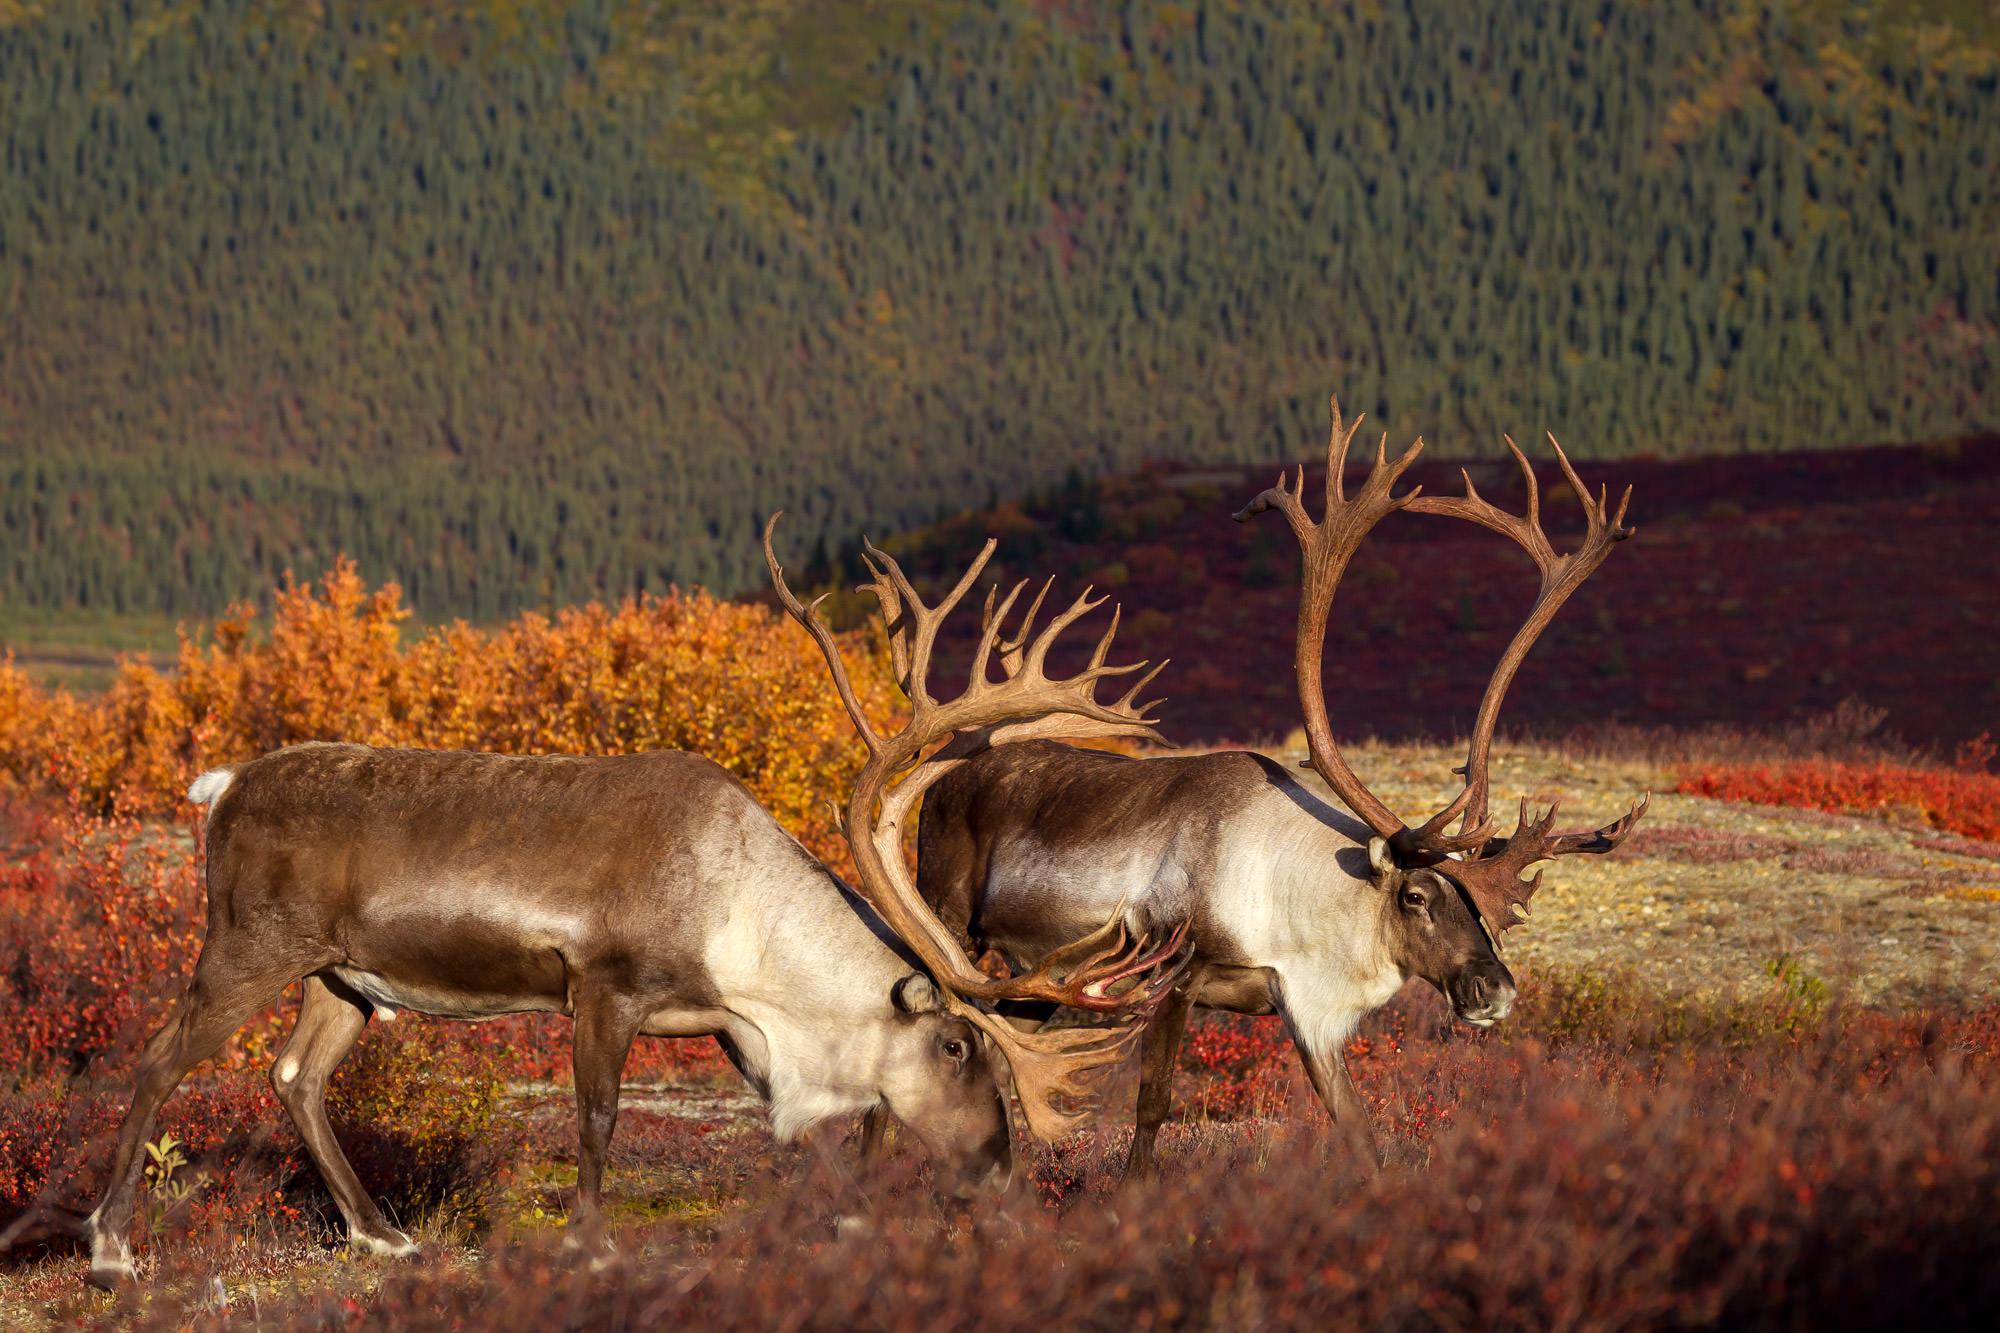 Caribou, Alaska, Denali, fall color, limited edition, photograph, fine art, wildlife, photo